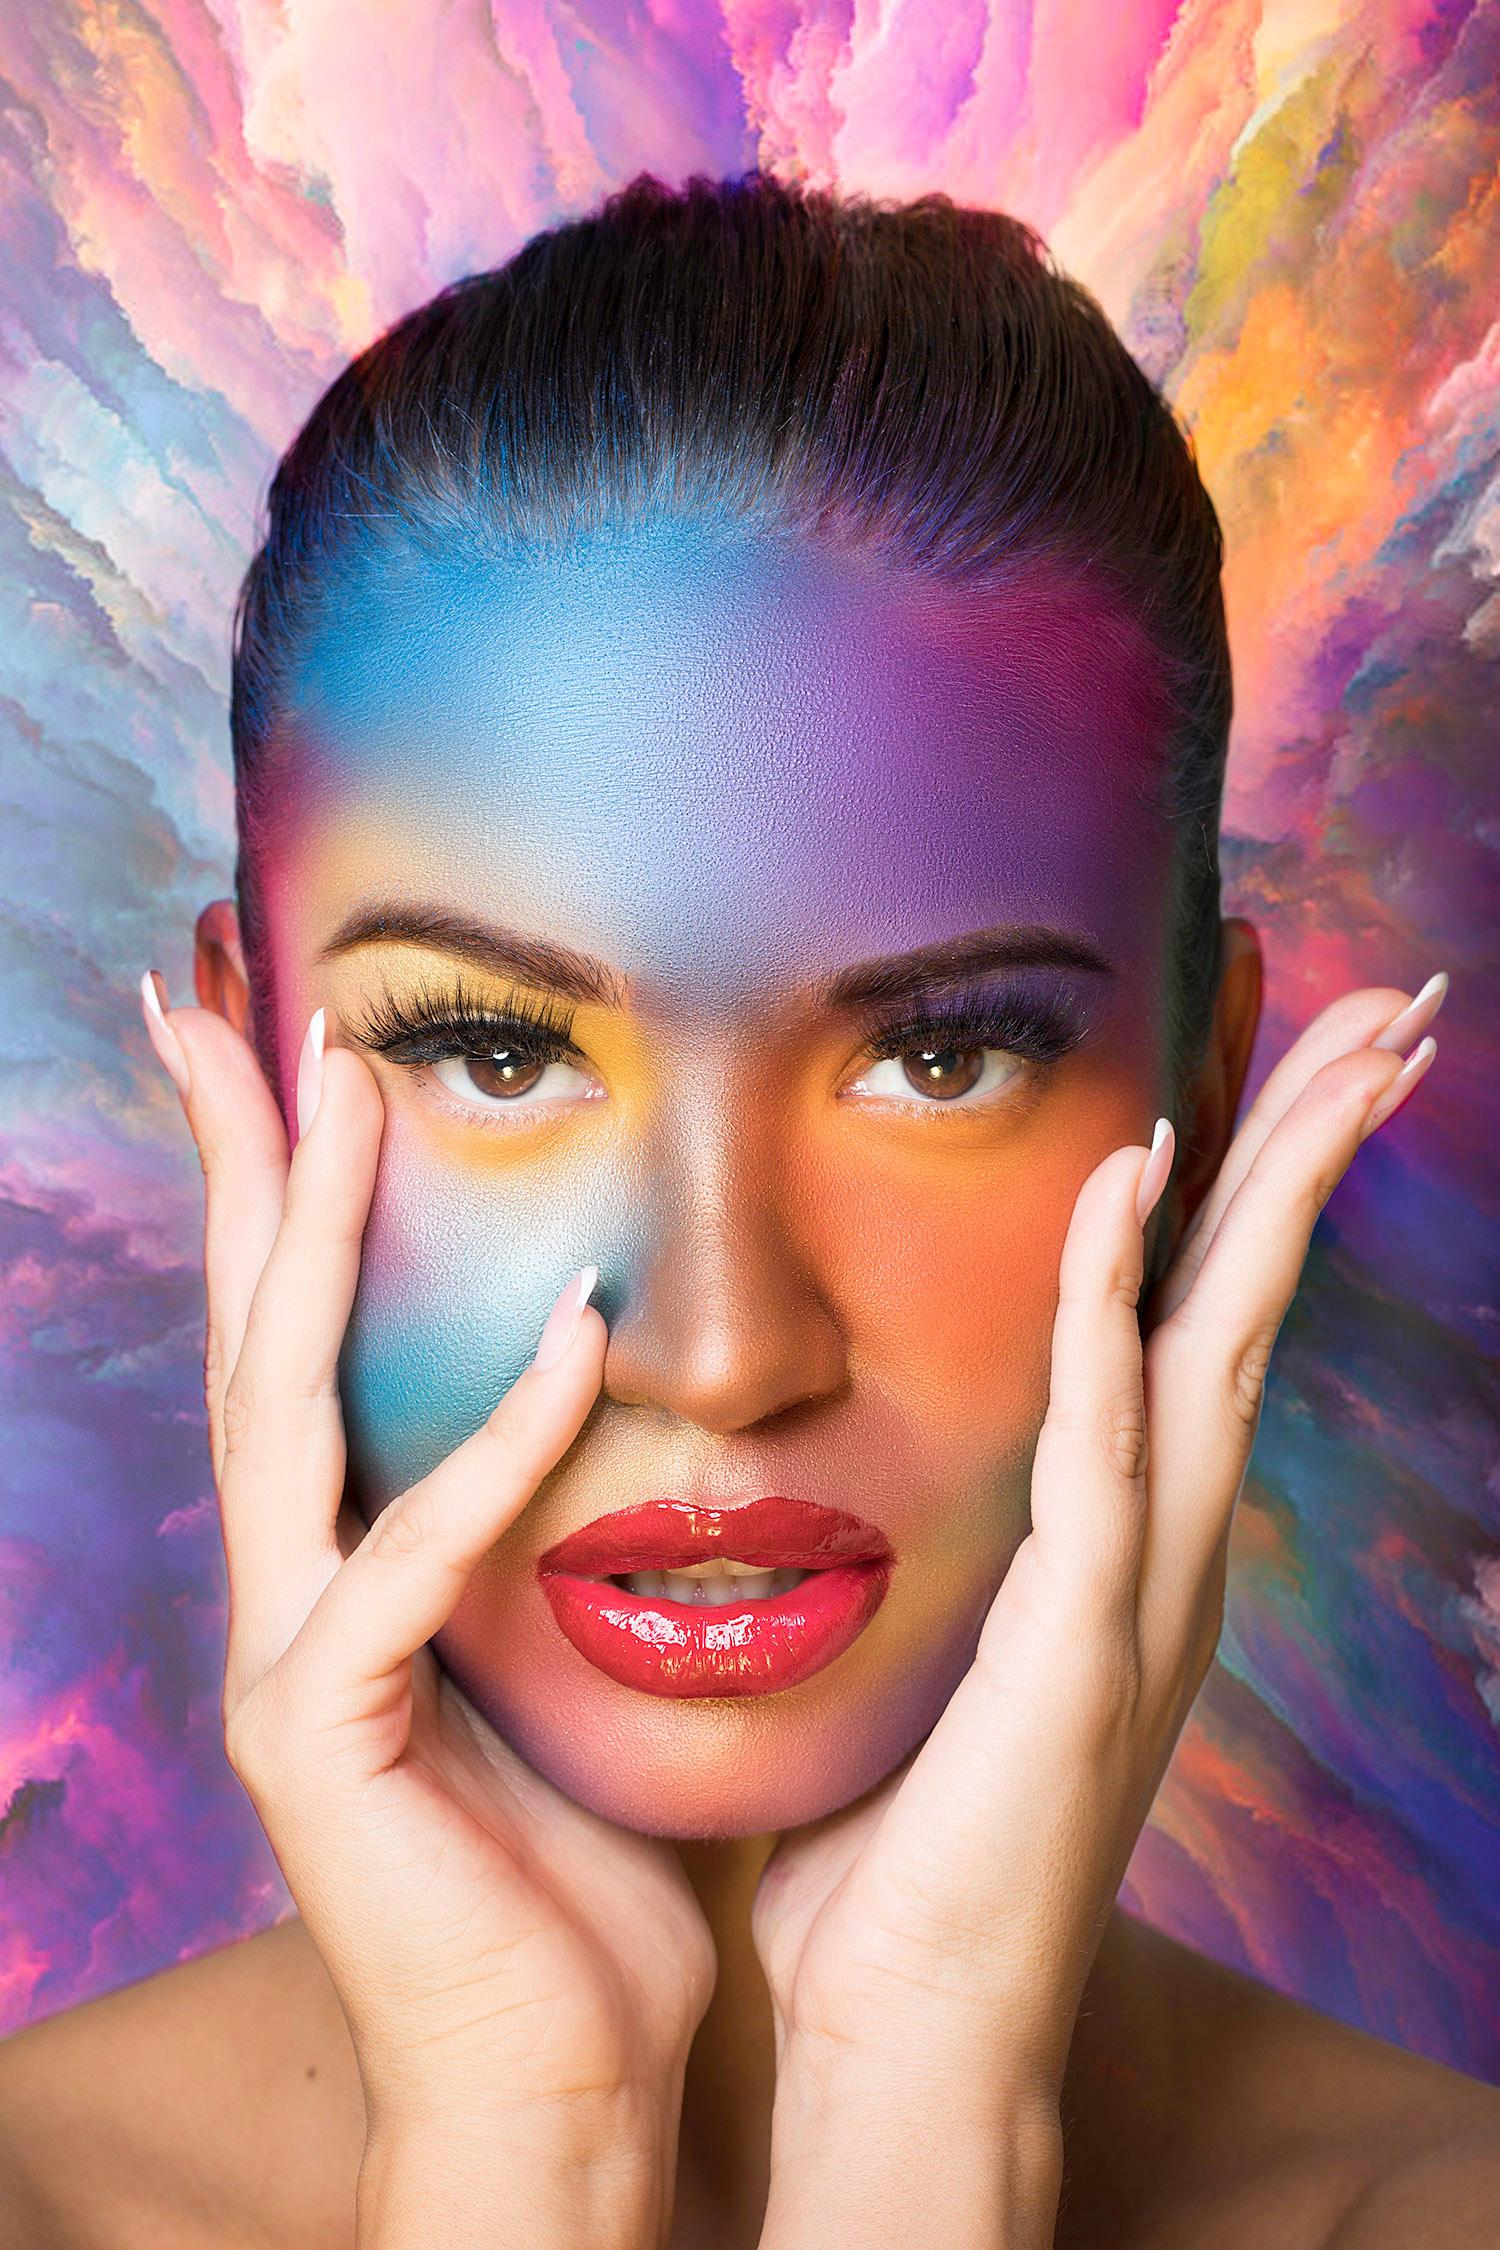 Beauty editorial photoshoot 'Colors Galore' by Loesje Kessels Fashion Photographer Dubai